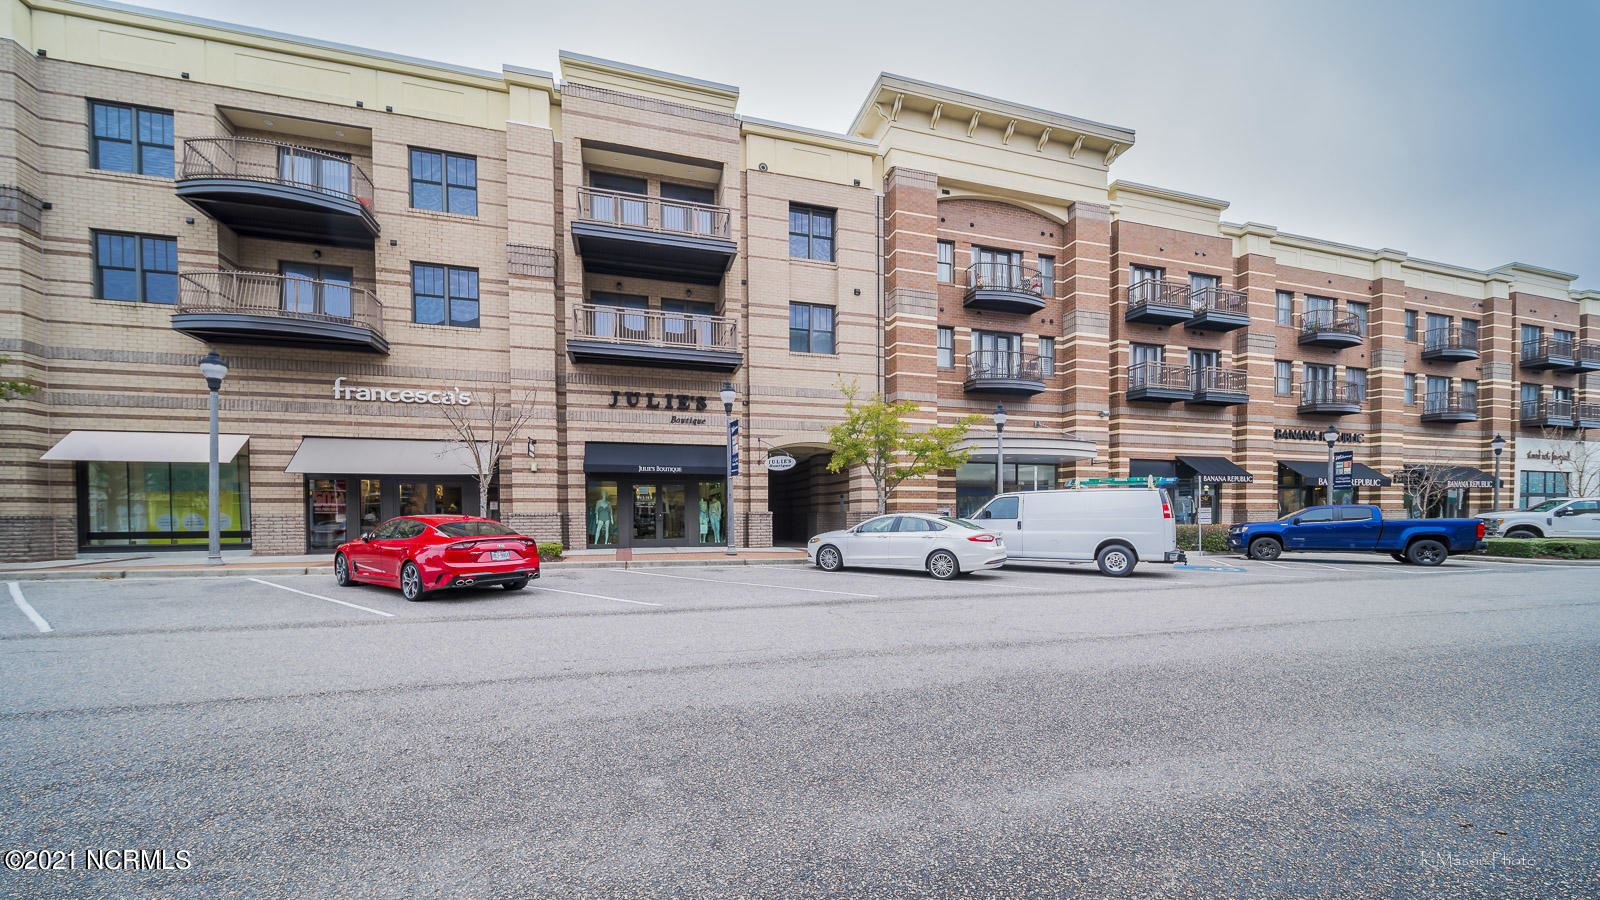 Photo for 6831 Main Street #Unit 232, Wilmington, NC 28405 (MLS # 100283427)